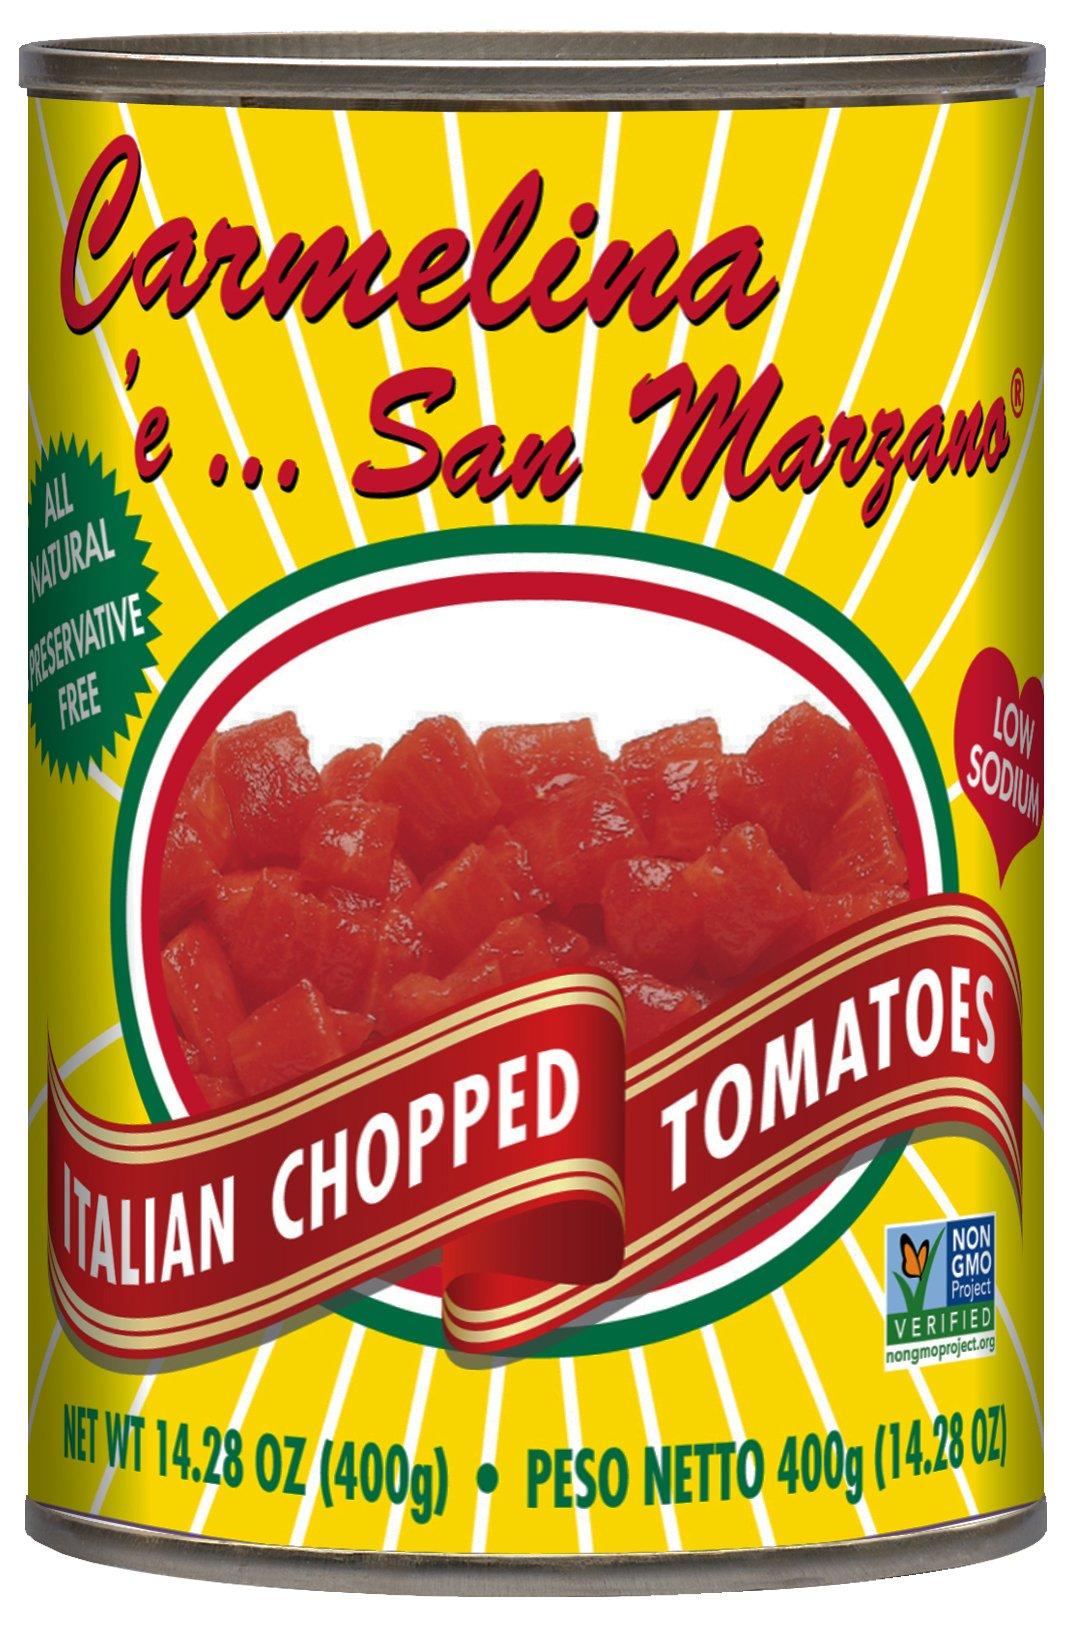 Carmelina San Marzano Italian Chopped Tomatoes in Puree, 14.28 ounce (Pack of 12) by Carmelina Brands